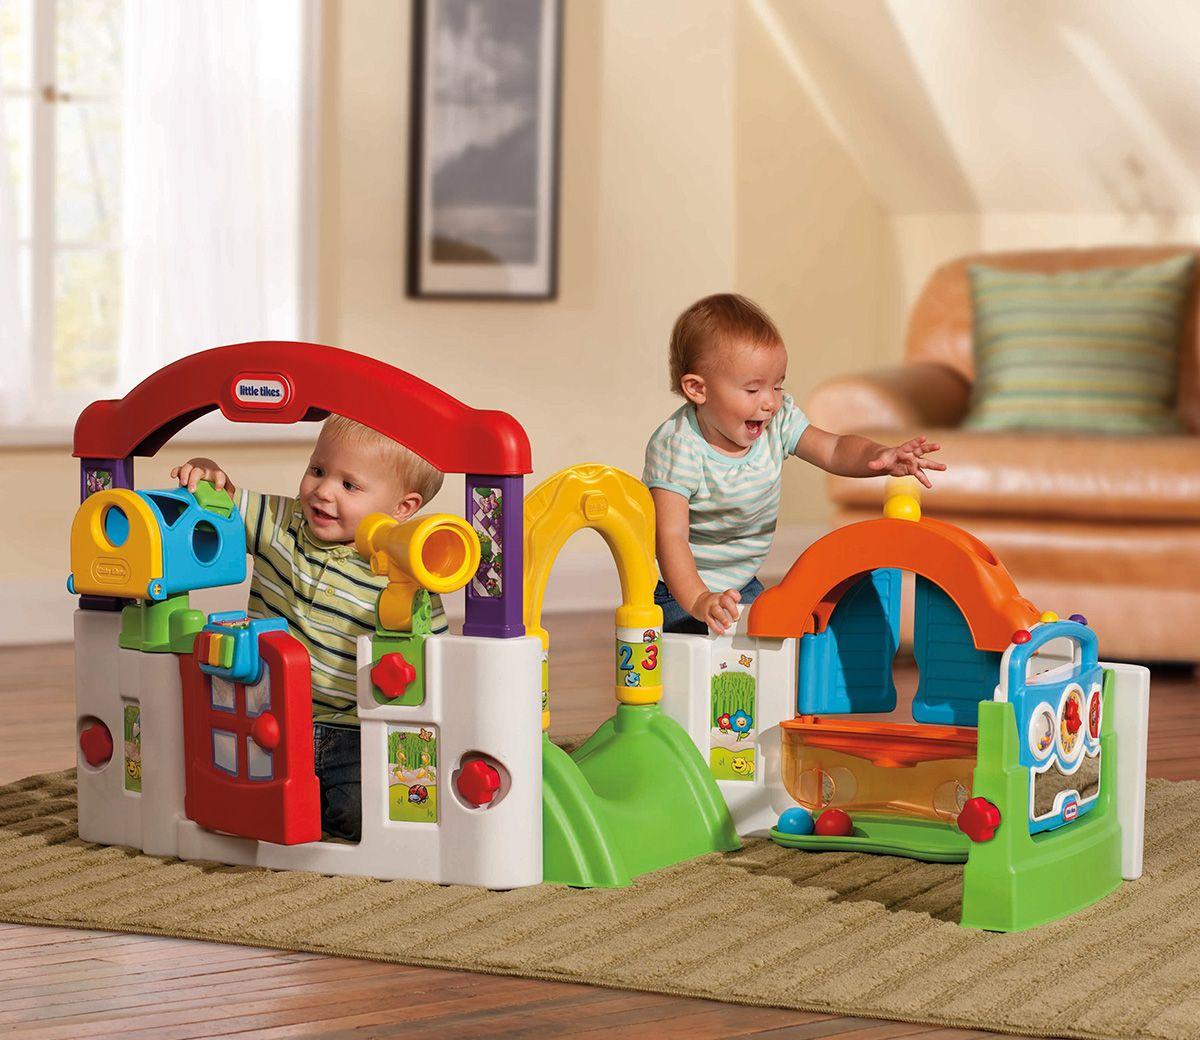 Activity Garden in 2020 Little tikes, Baby girl toys